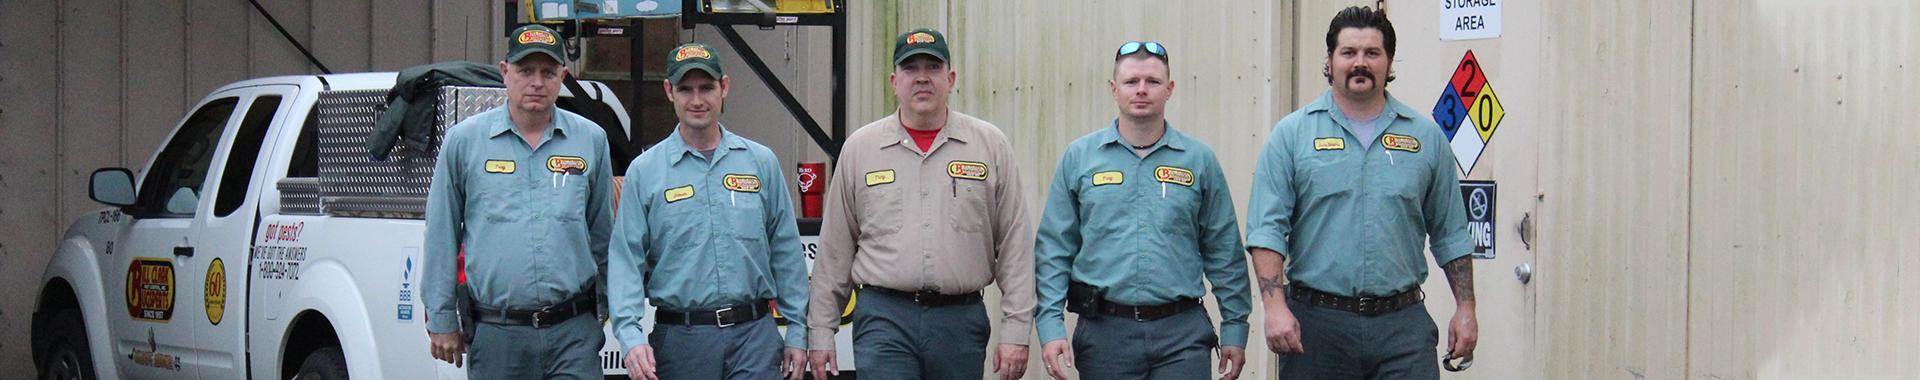 bugsperts of bill clark pest control